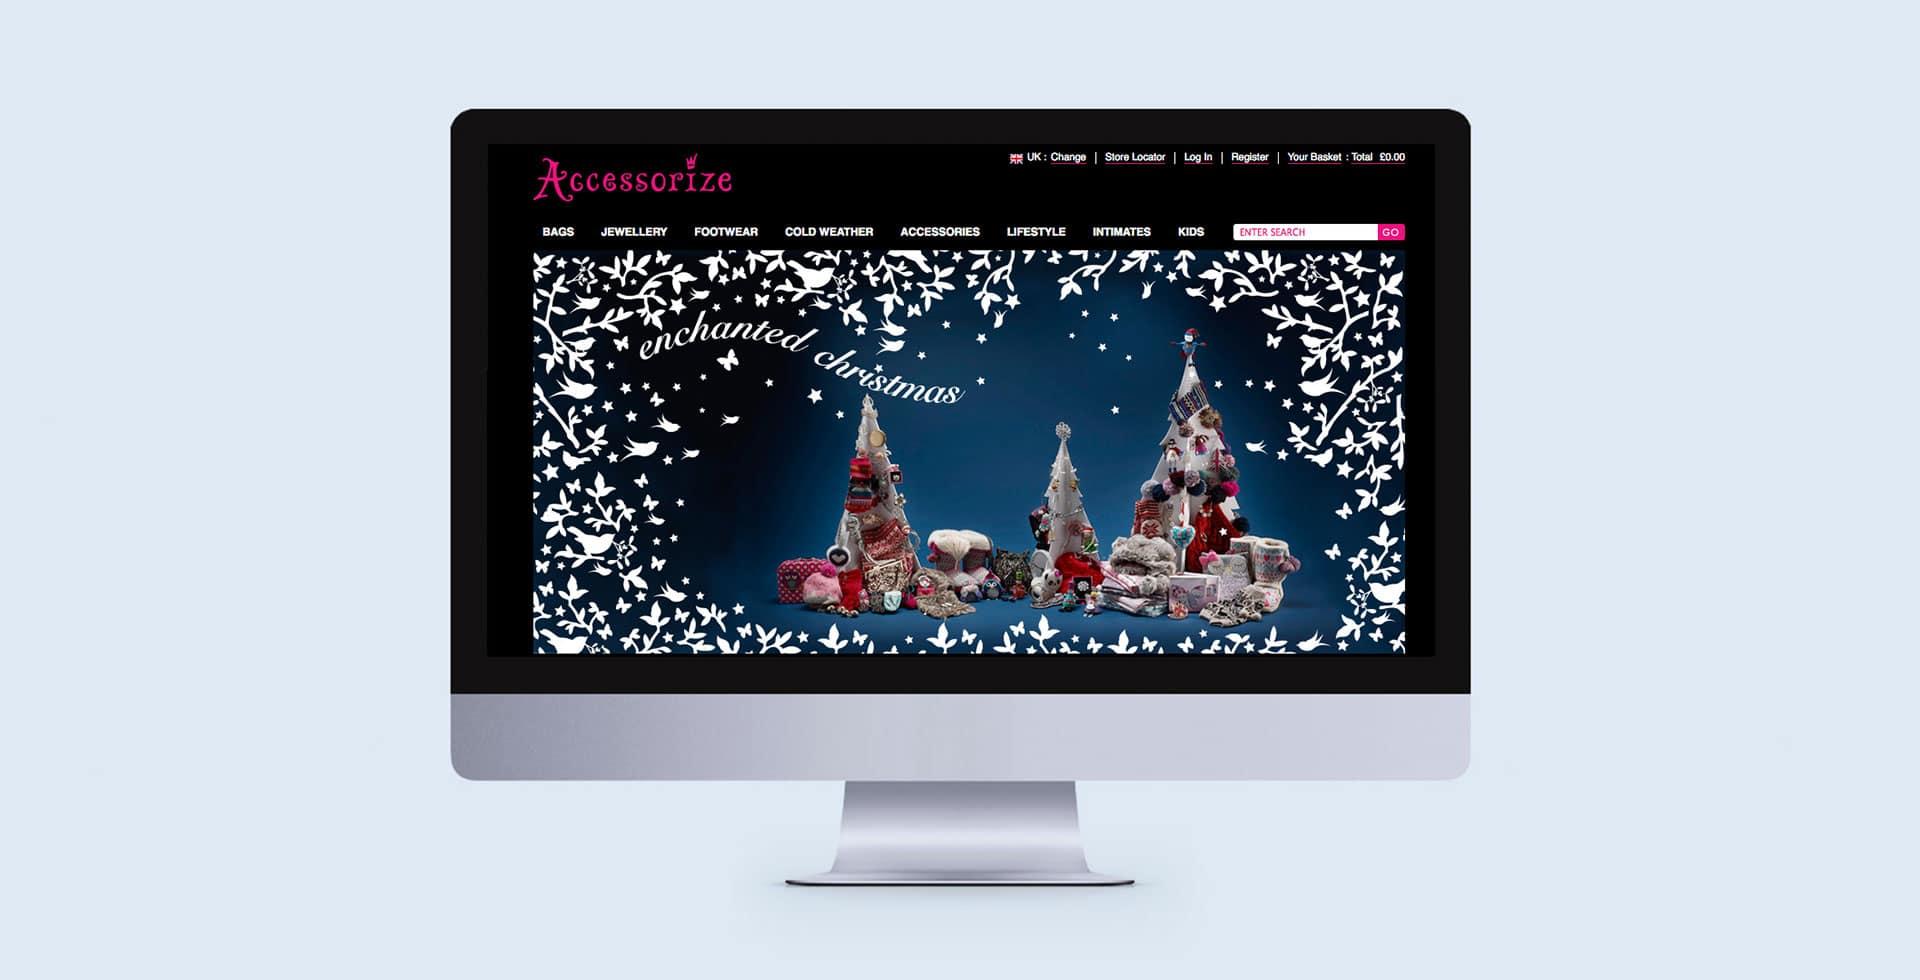 Accessorize Christmas 2011 creative